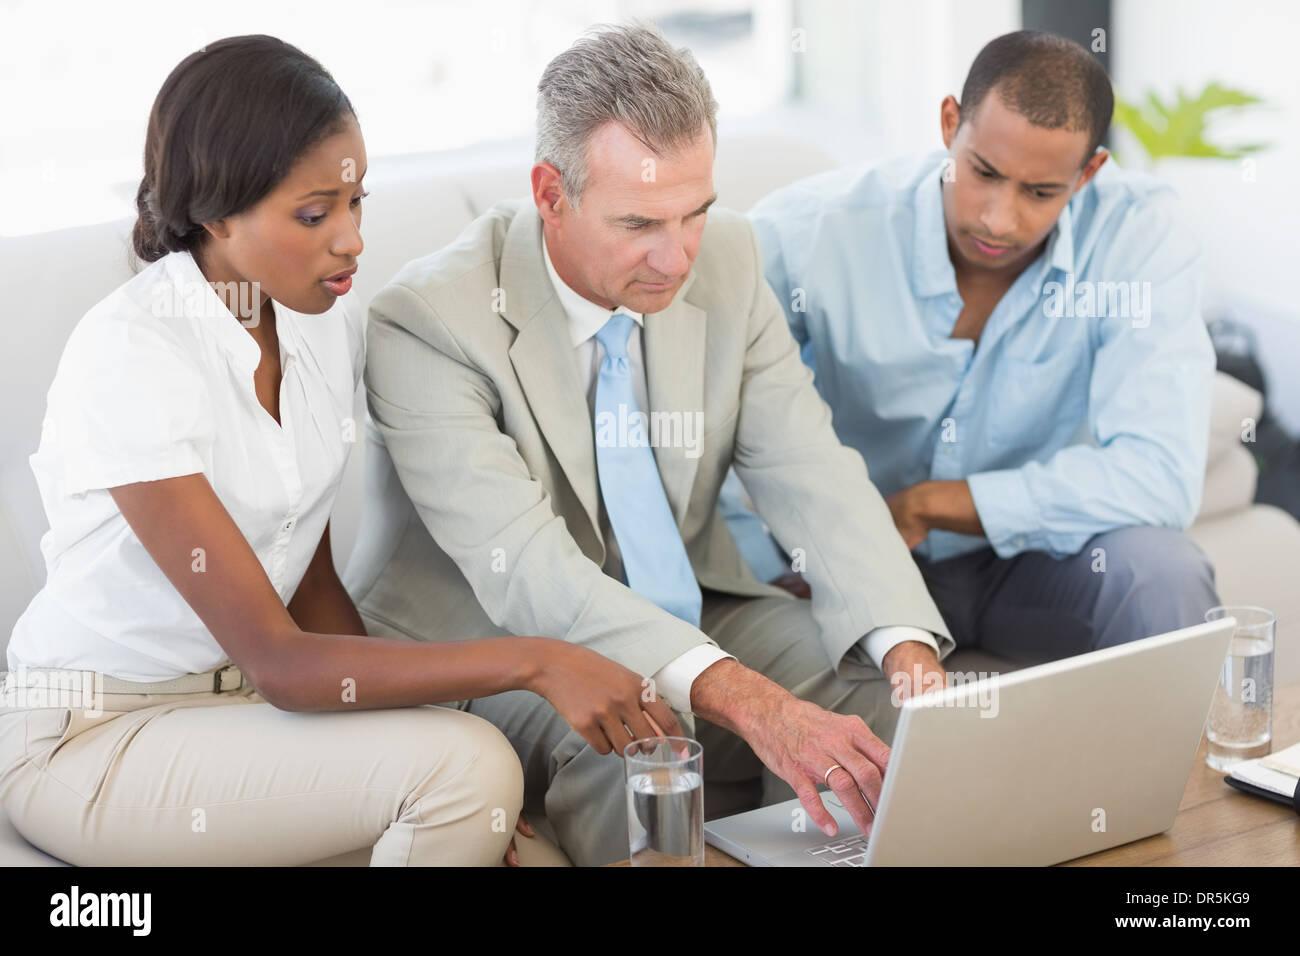 Salesman showing something on laptop to couple on sofa - Stock Image